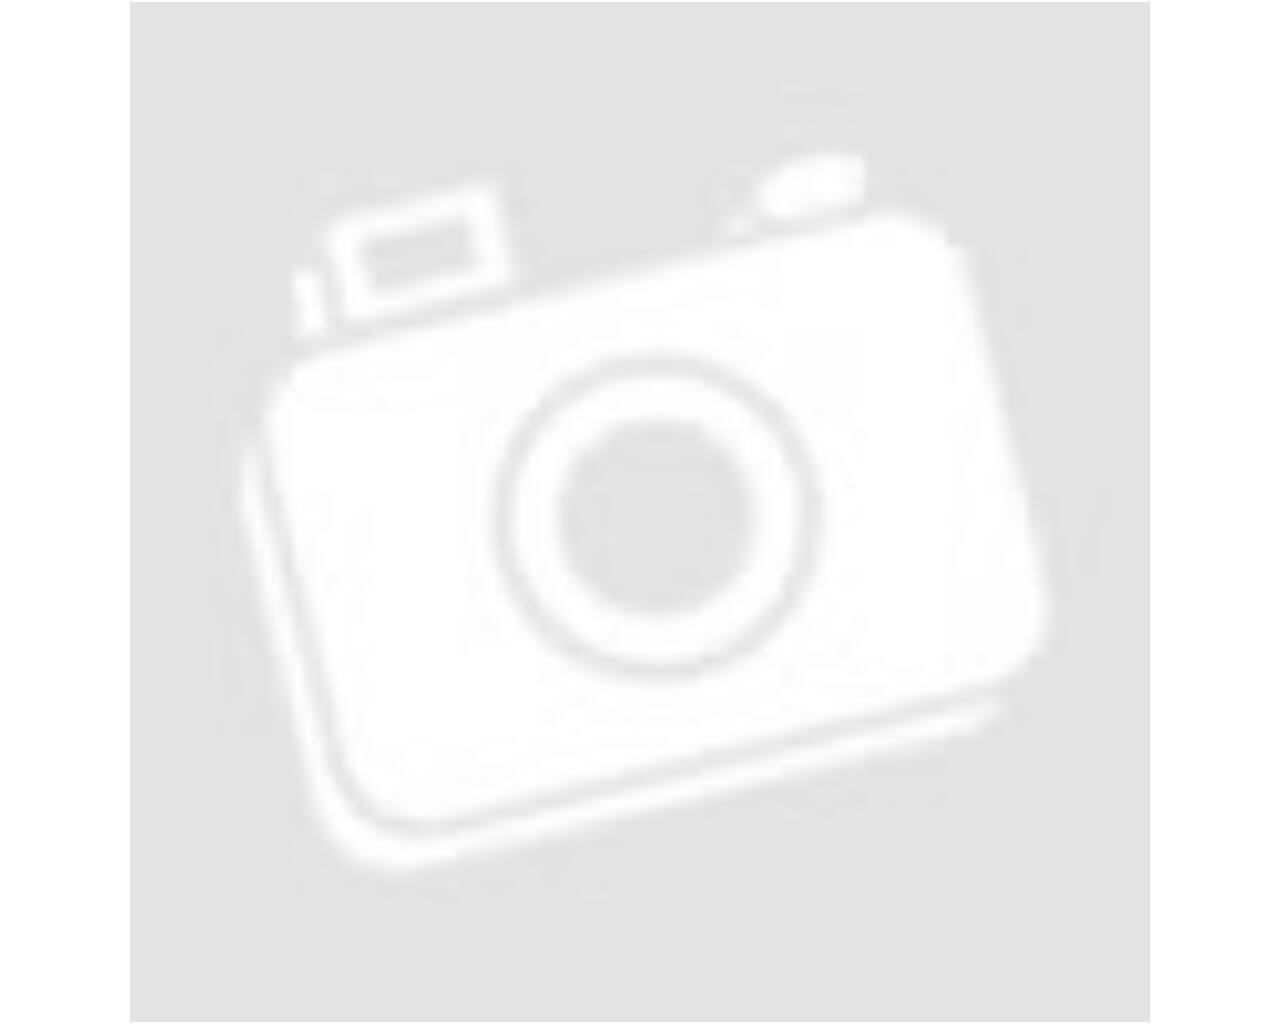 Porszivó Samsung VC07M25E0WR/GE